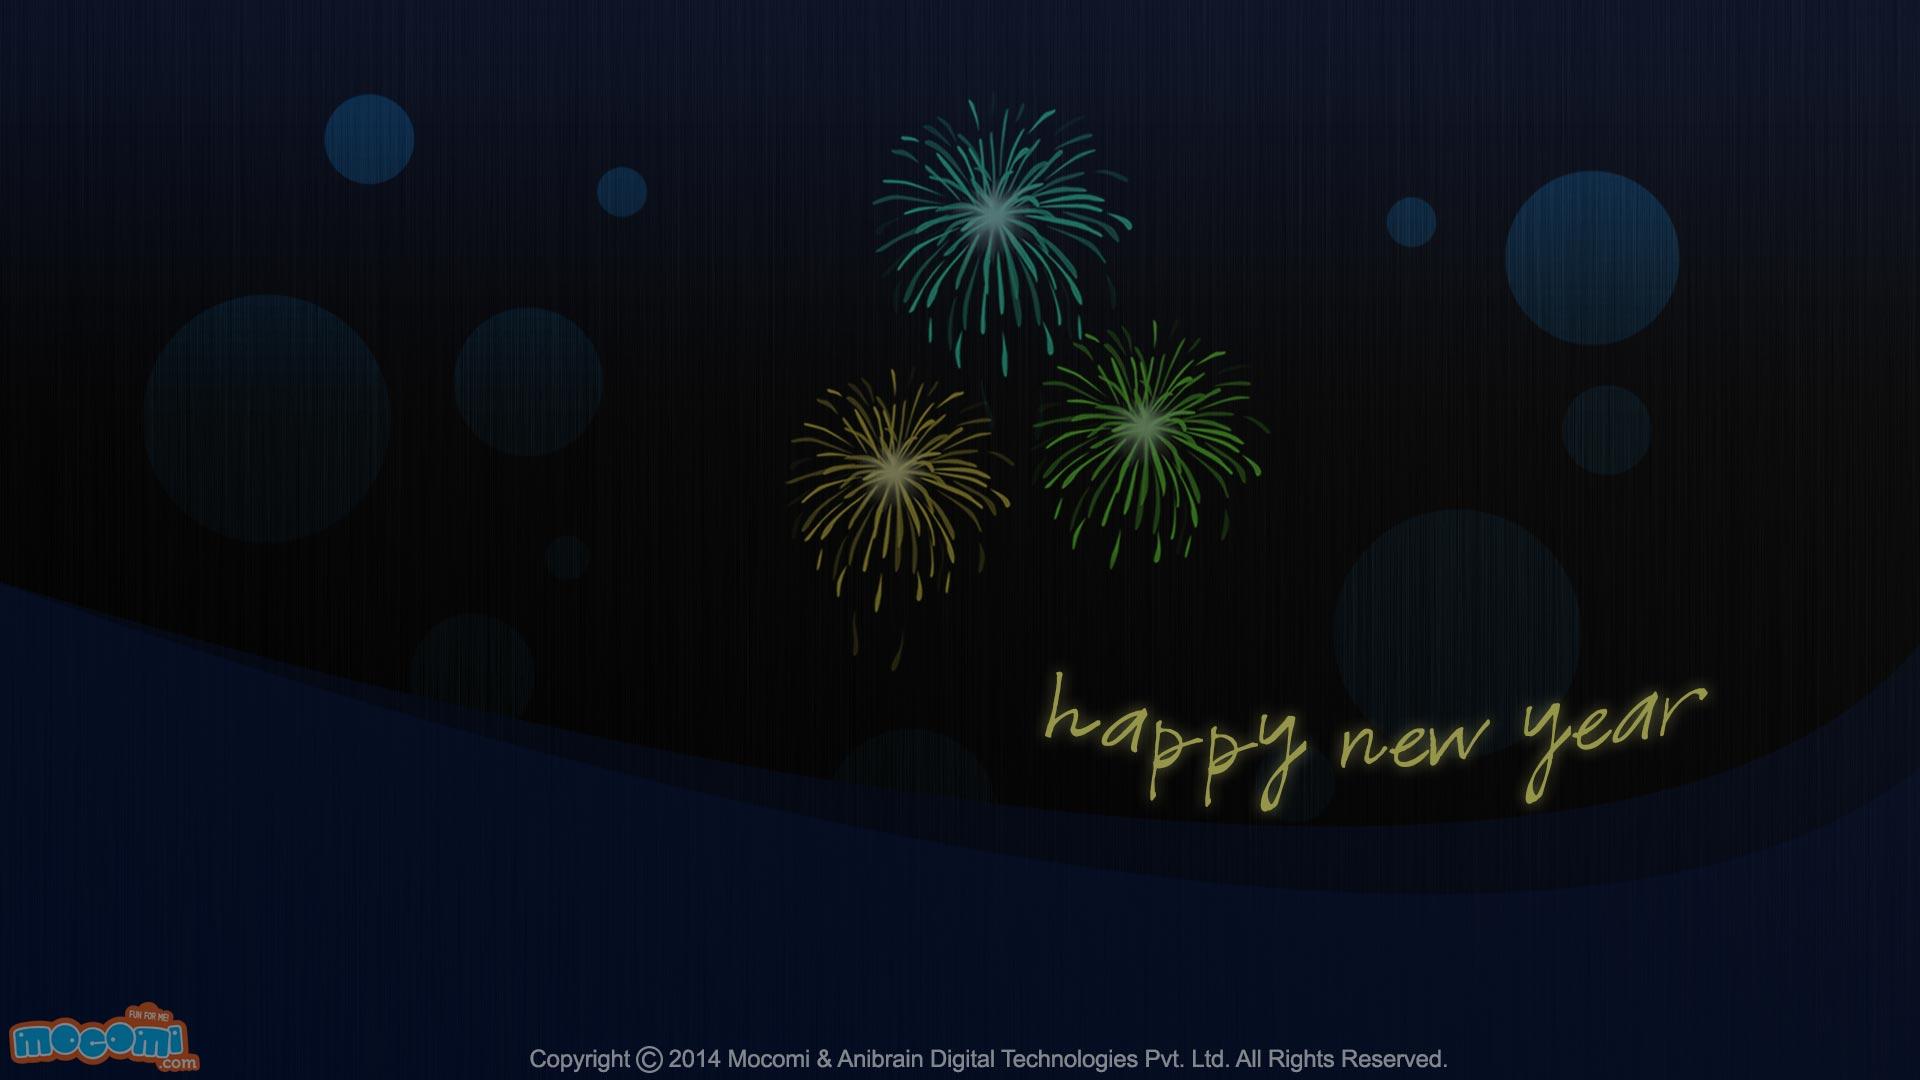 Happy New Year Wallpaper- 8